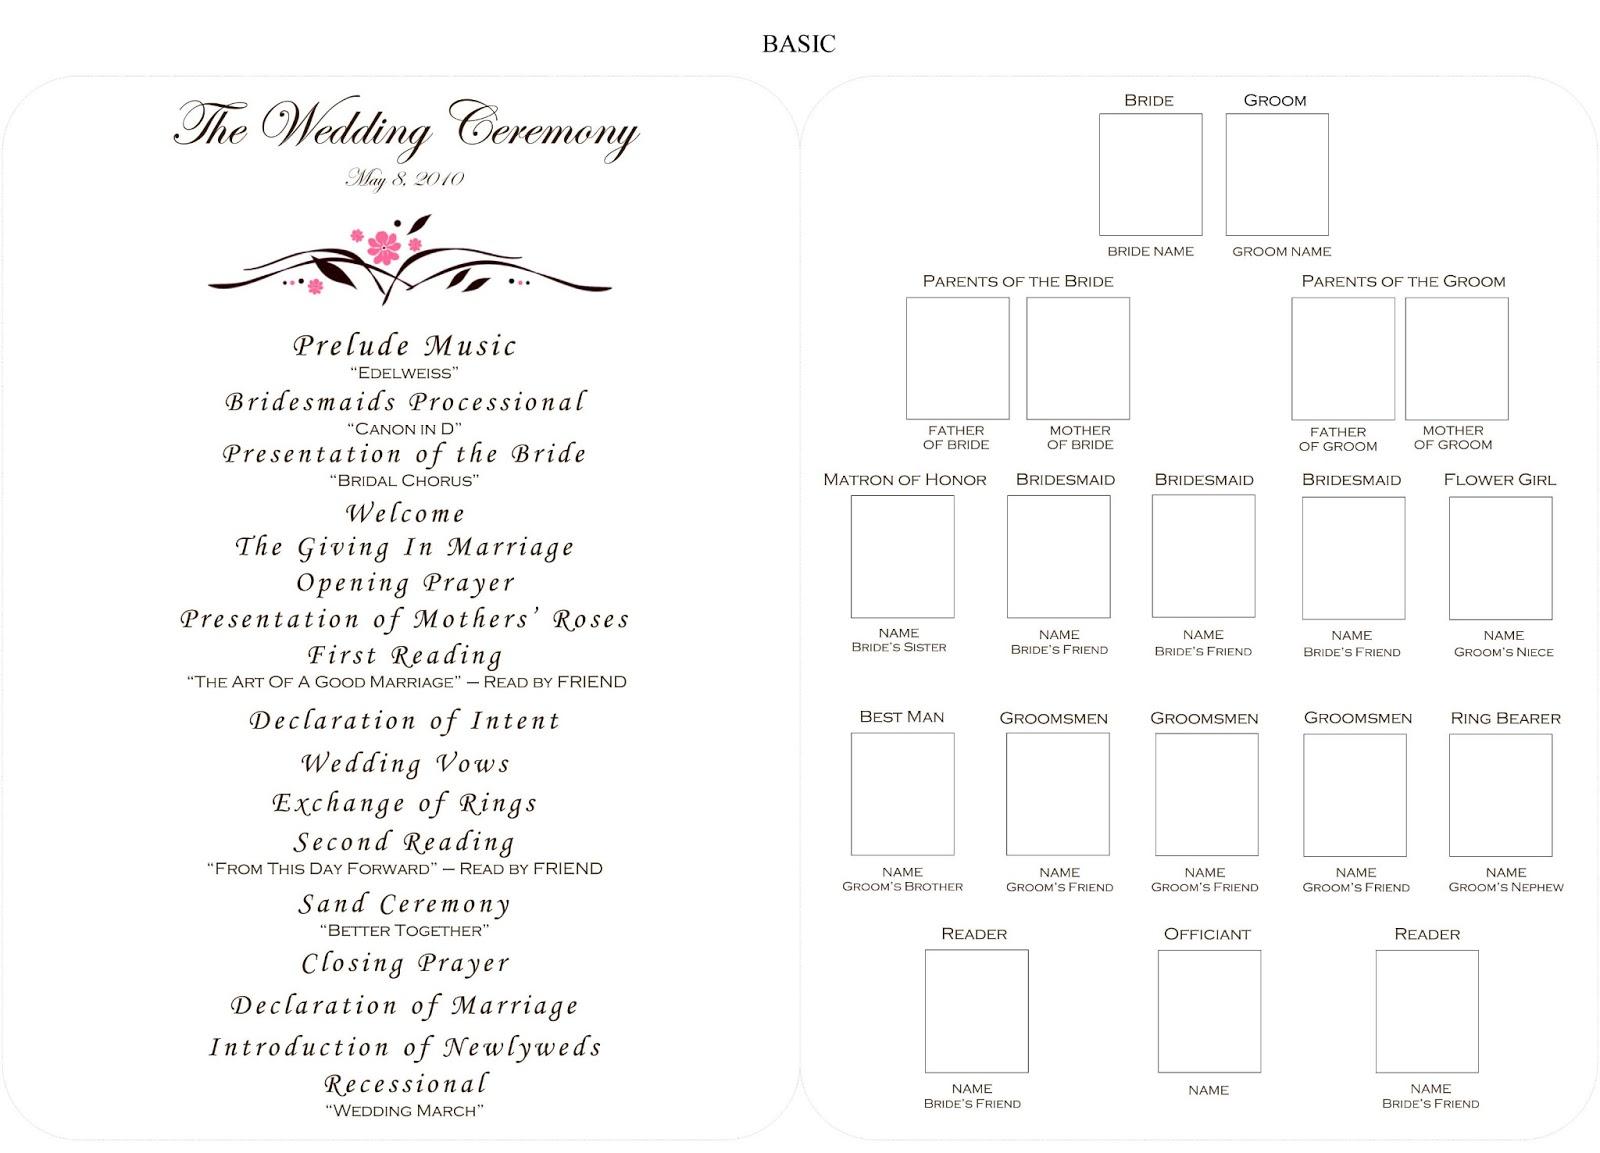 DIY Guide For Creating A Playbill Wedding Ceremony Fan Program - Blank wedding program template